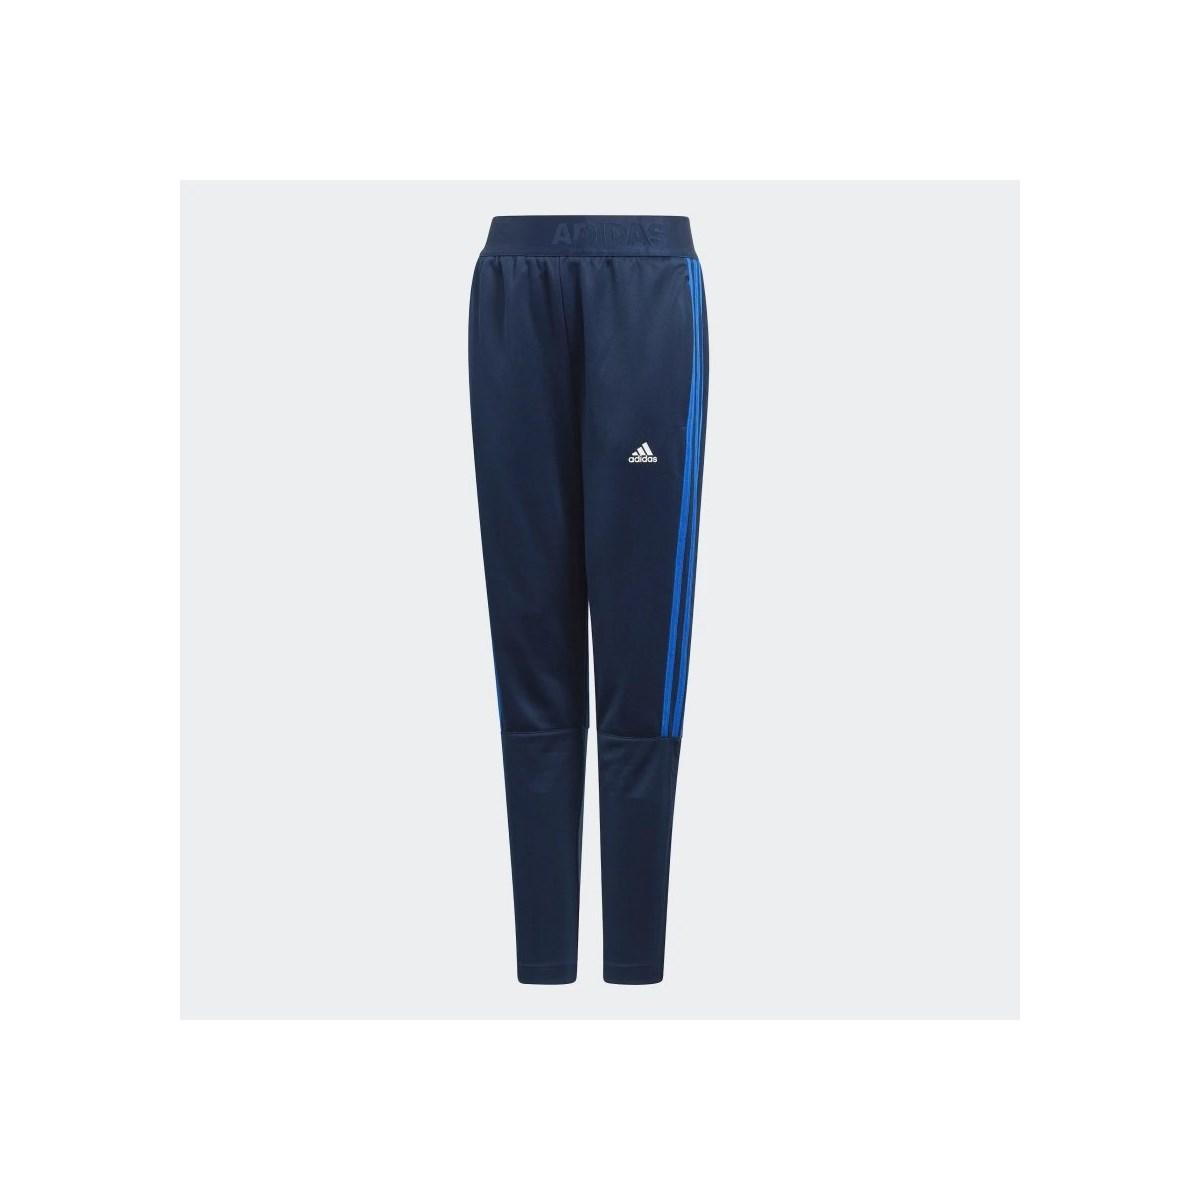 adidas Tiro Çocuk Mavi Eşofman Altı (ED5706)